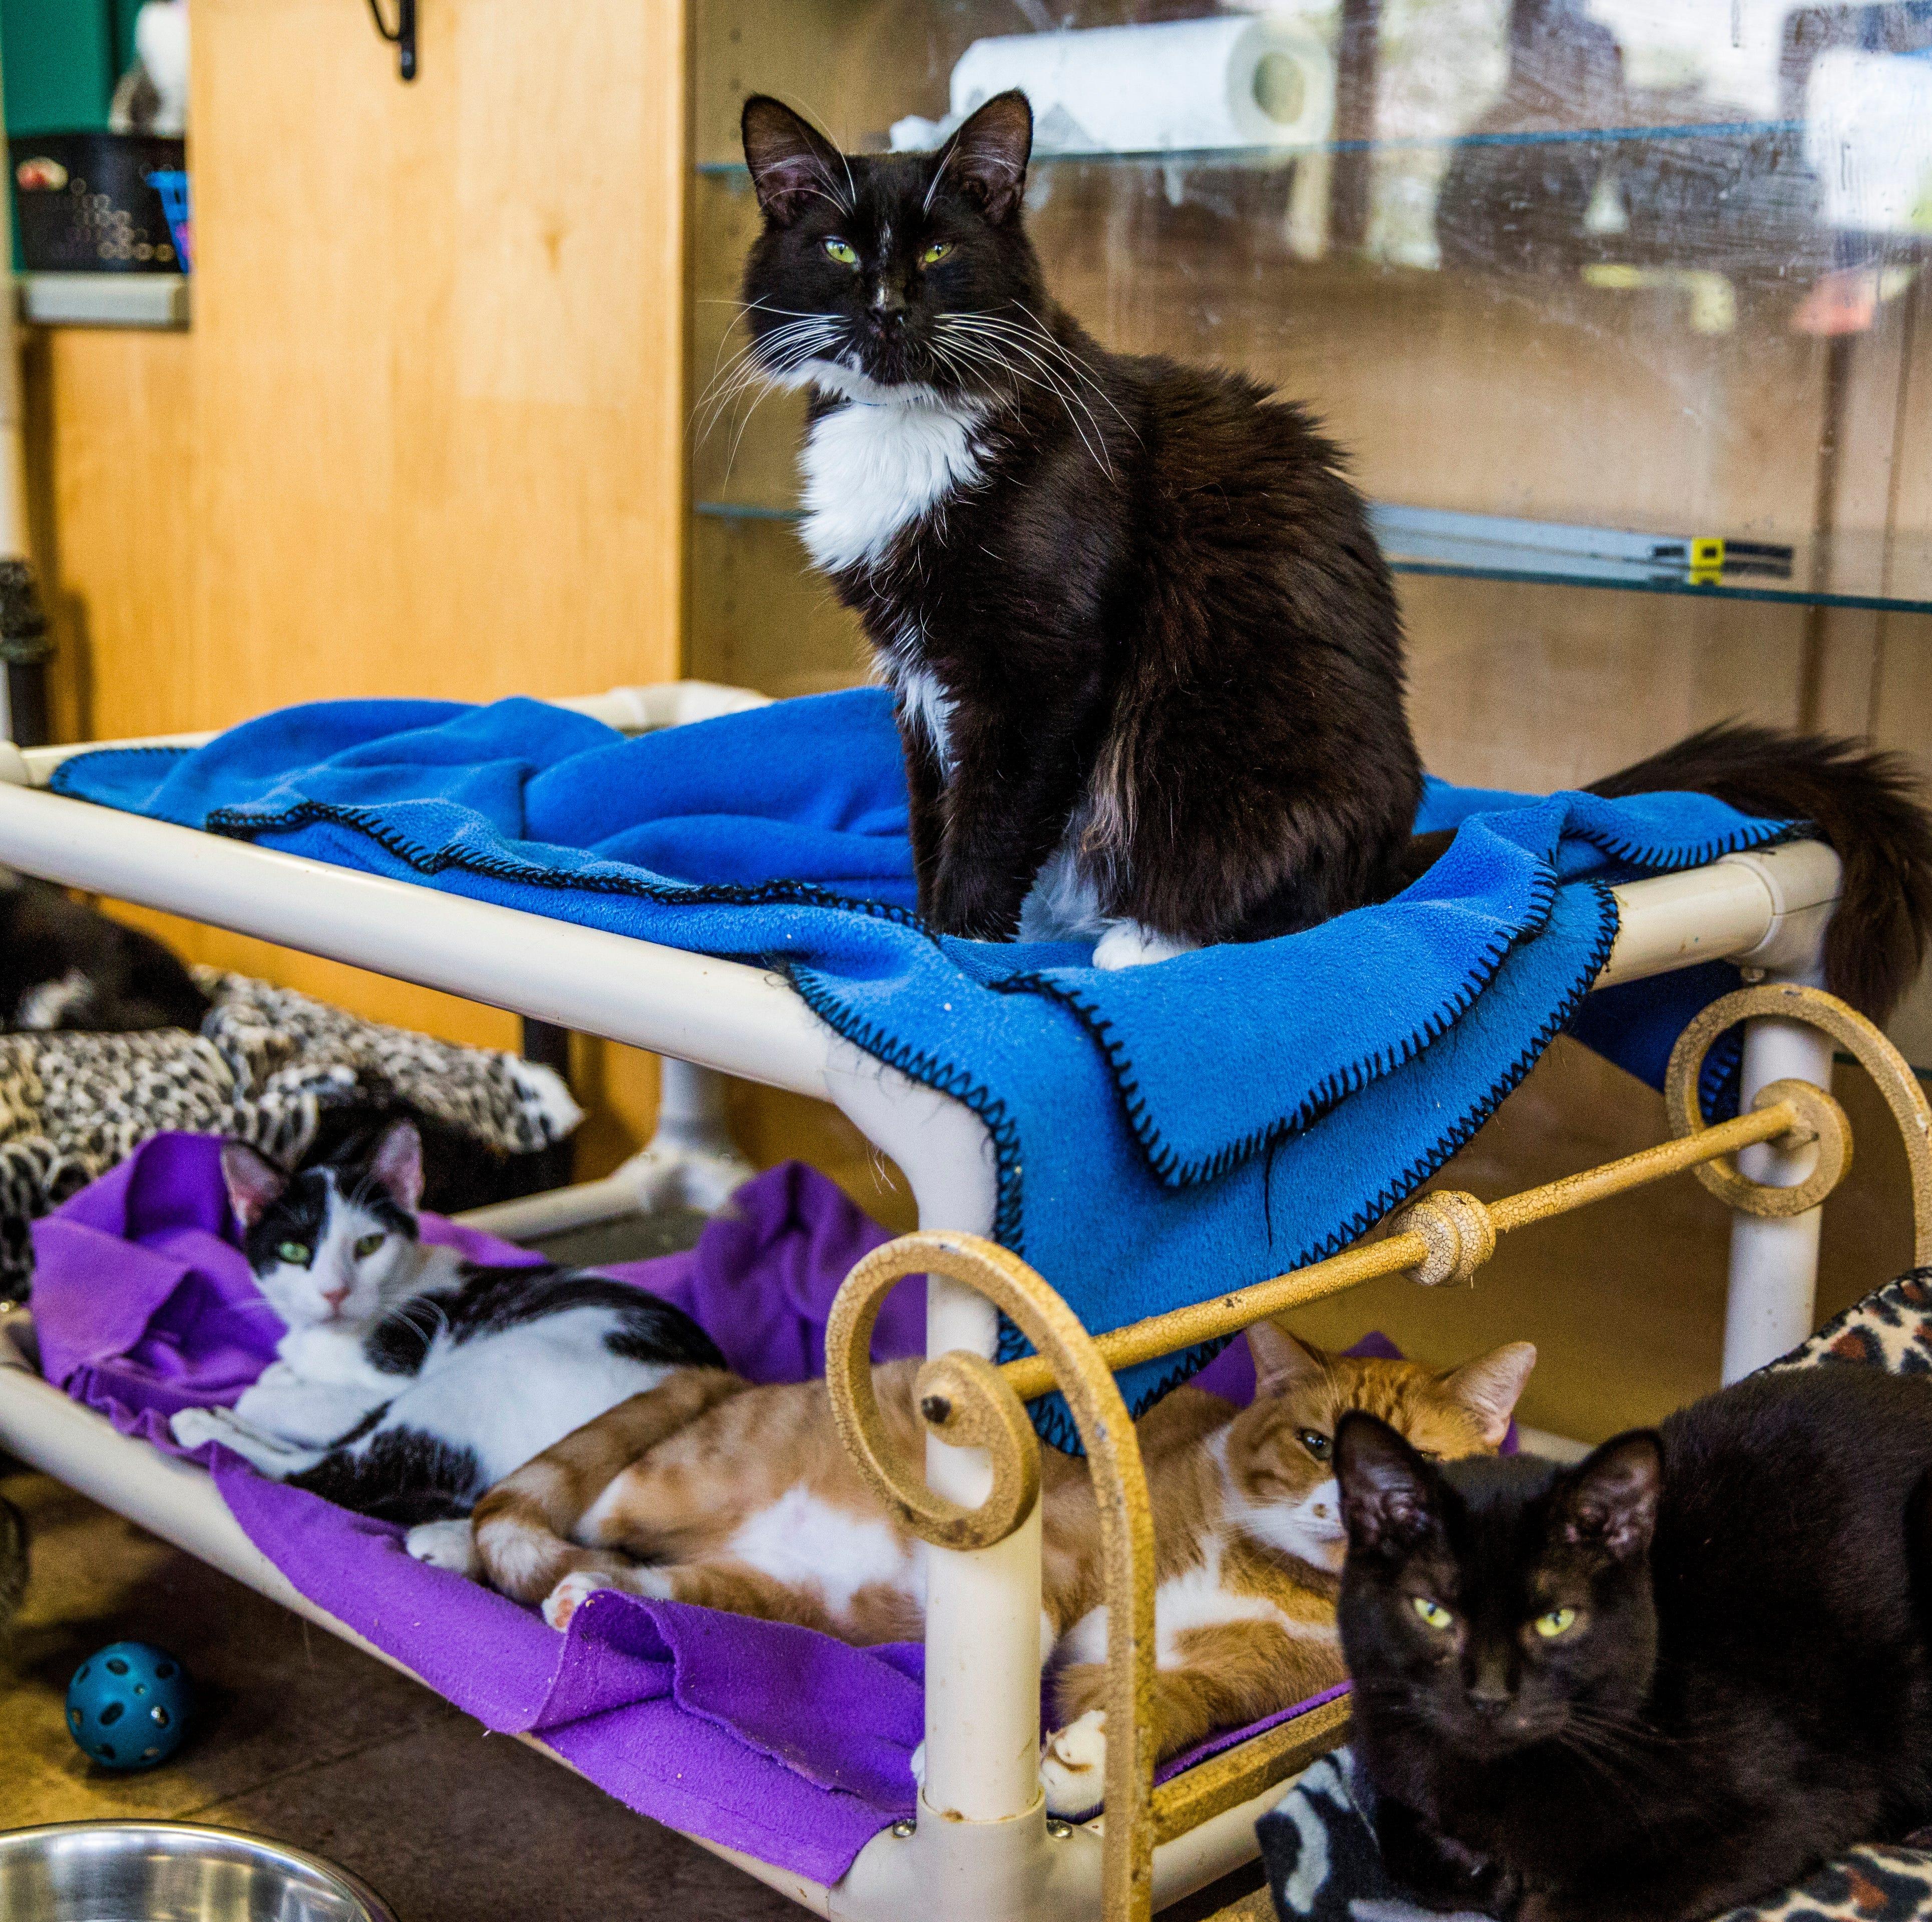 'Cane cats: Hurricane Irma scrambled county's vast population